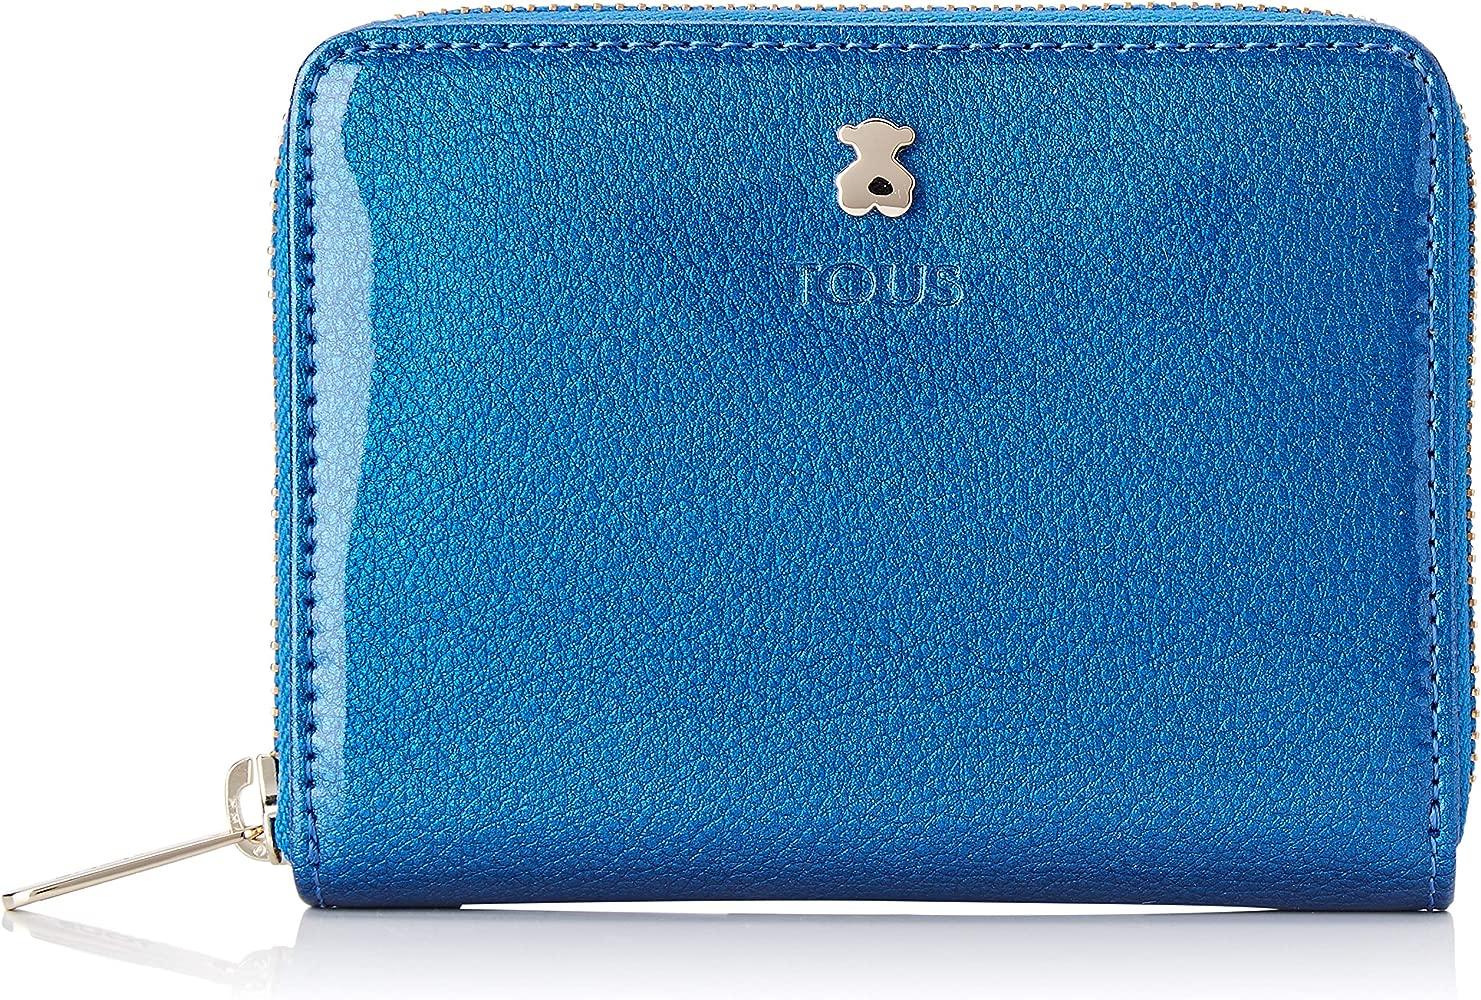 Tous Dorp - Monedero para Mujer, Azul, 13 x 11 x 2 cm ...